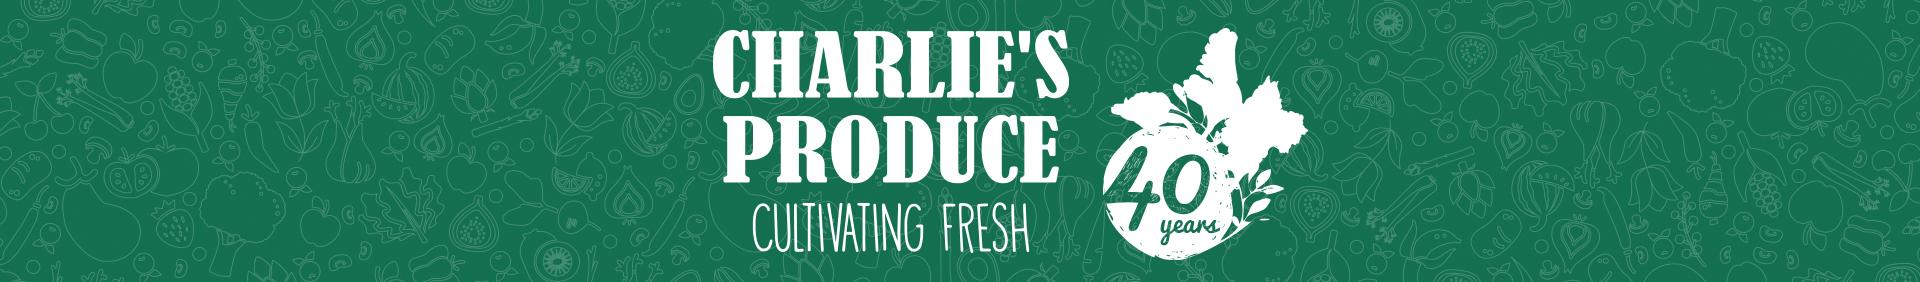 Charlie's Produce Logo Design | Seattle Marketing Agency | CMA